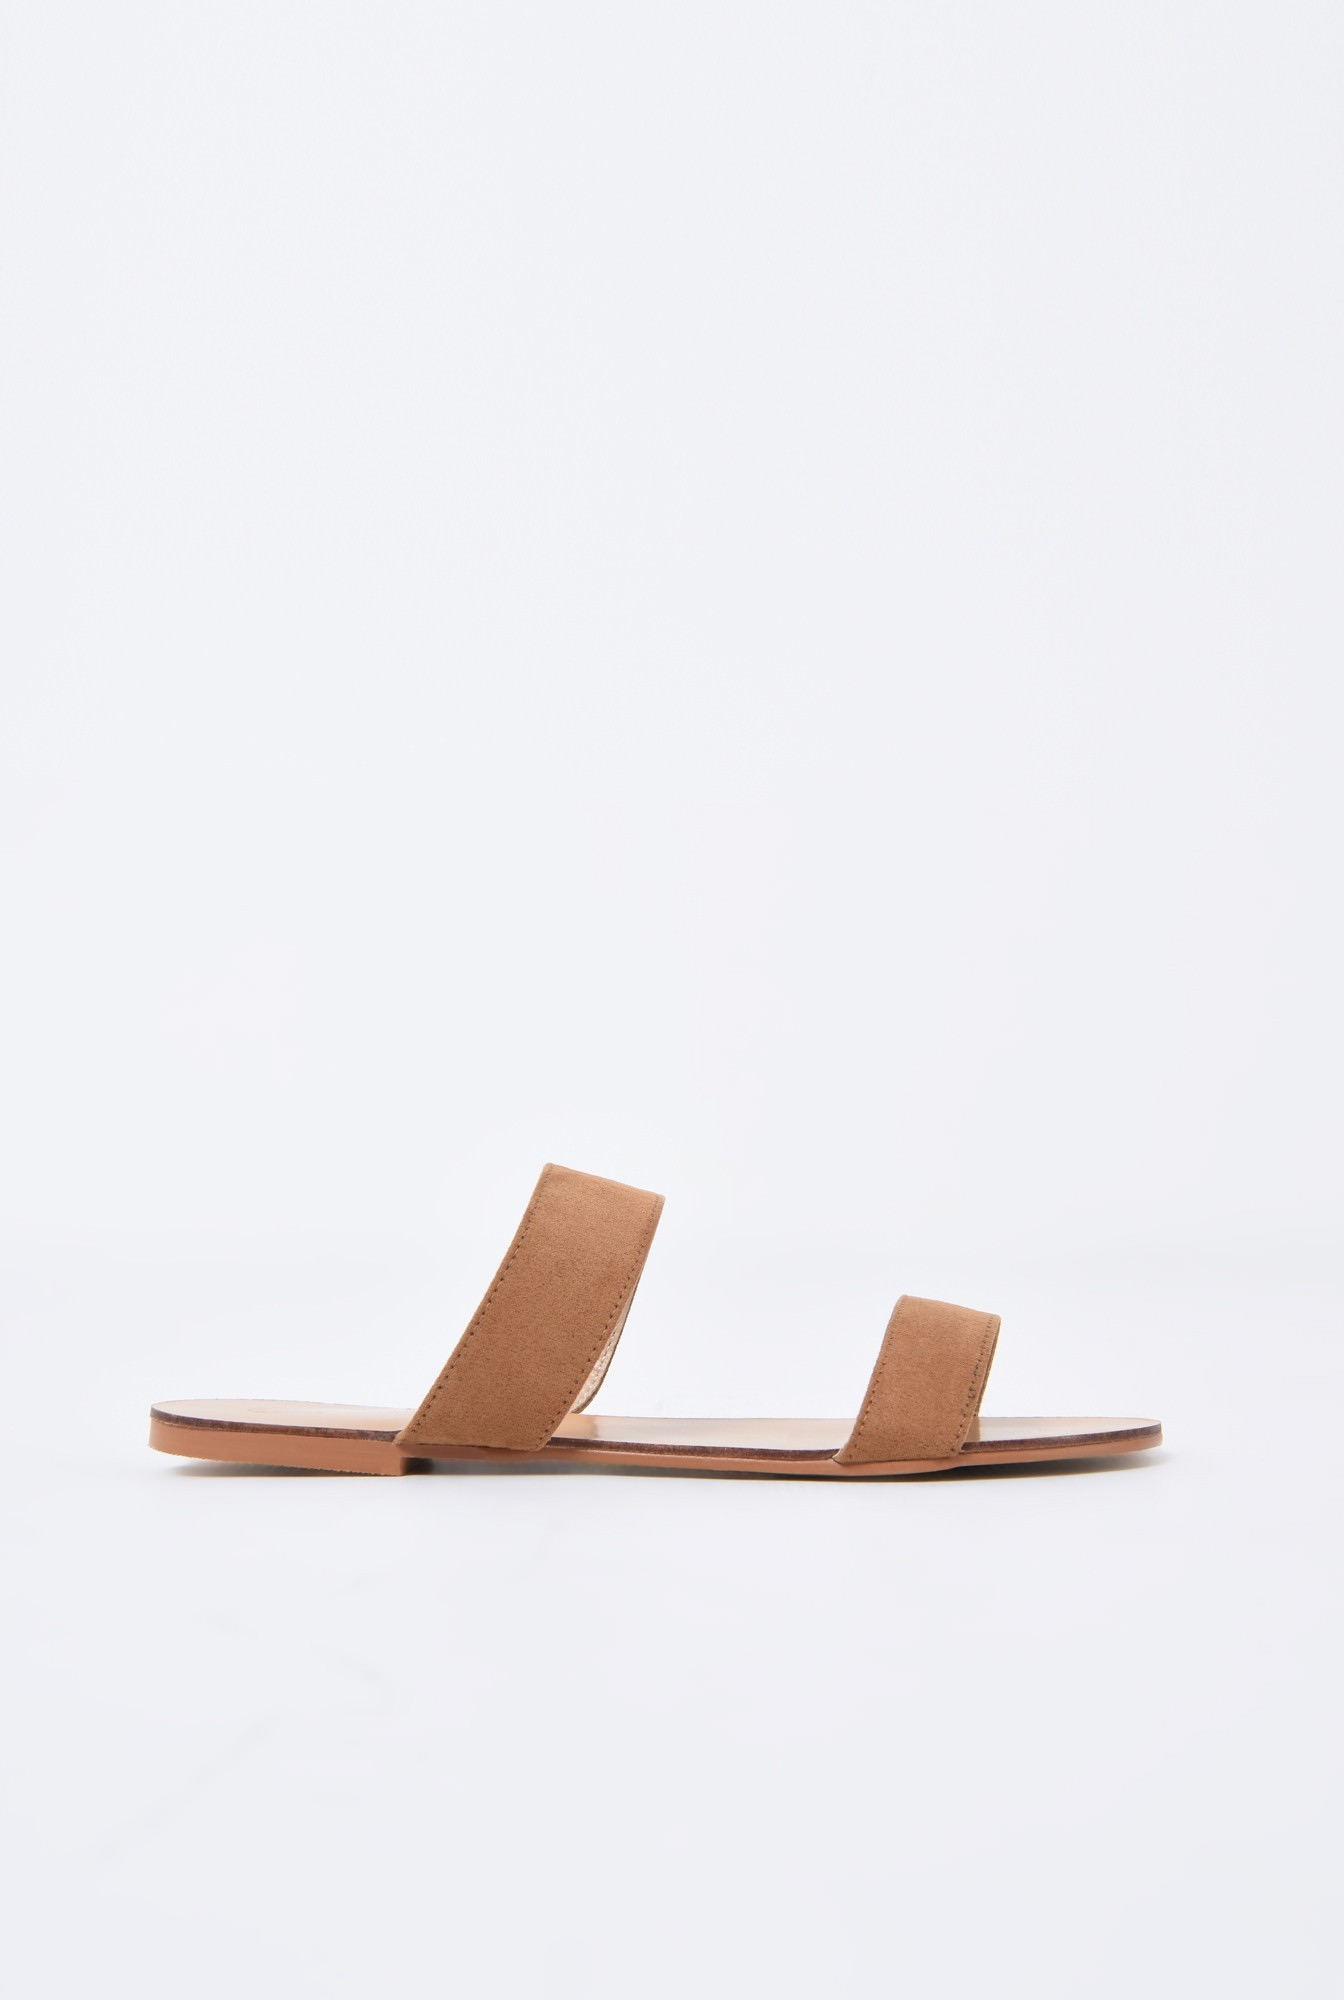 0 - papuci cu talpa joasa, velur, camel, barete late